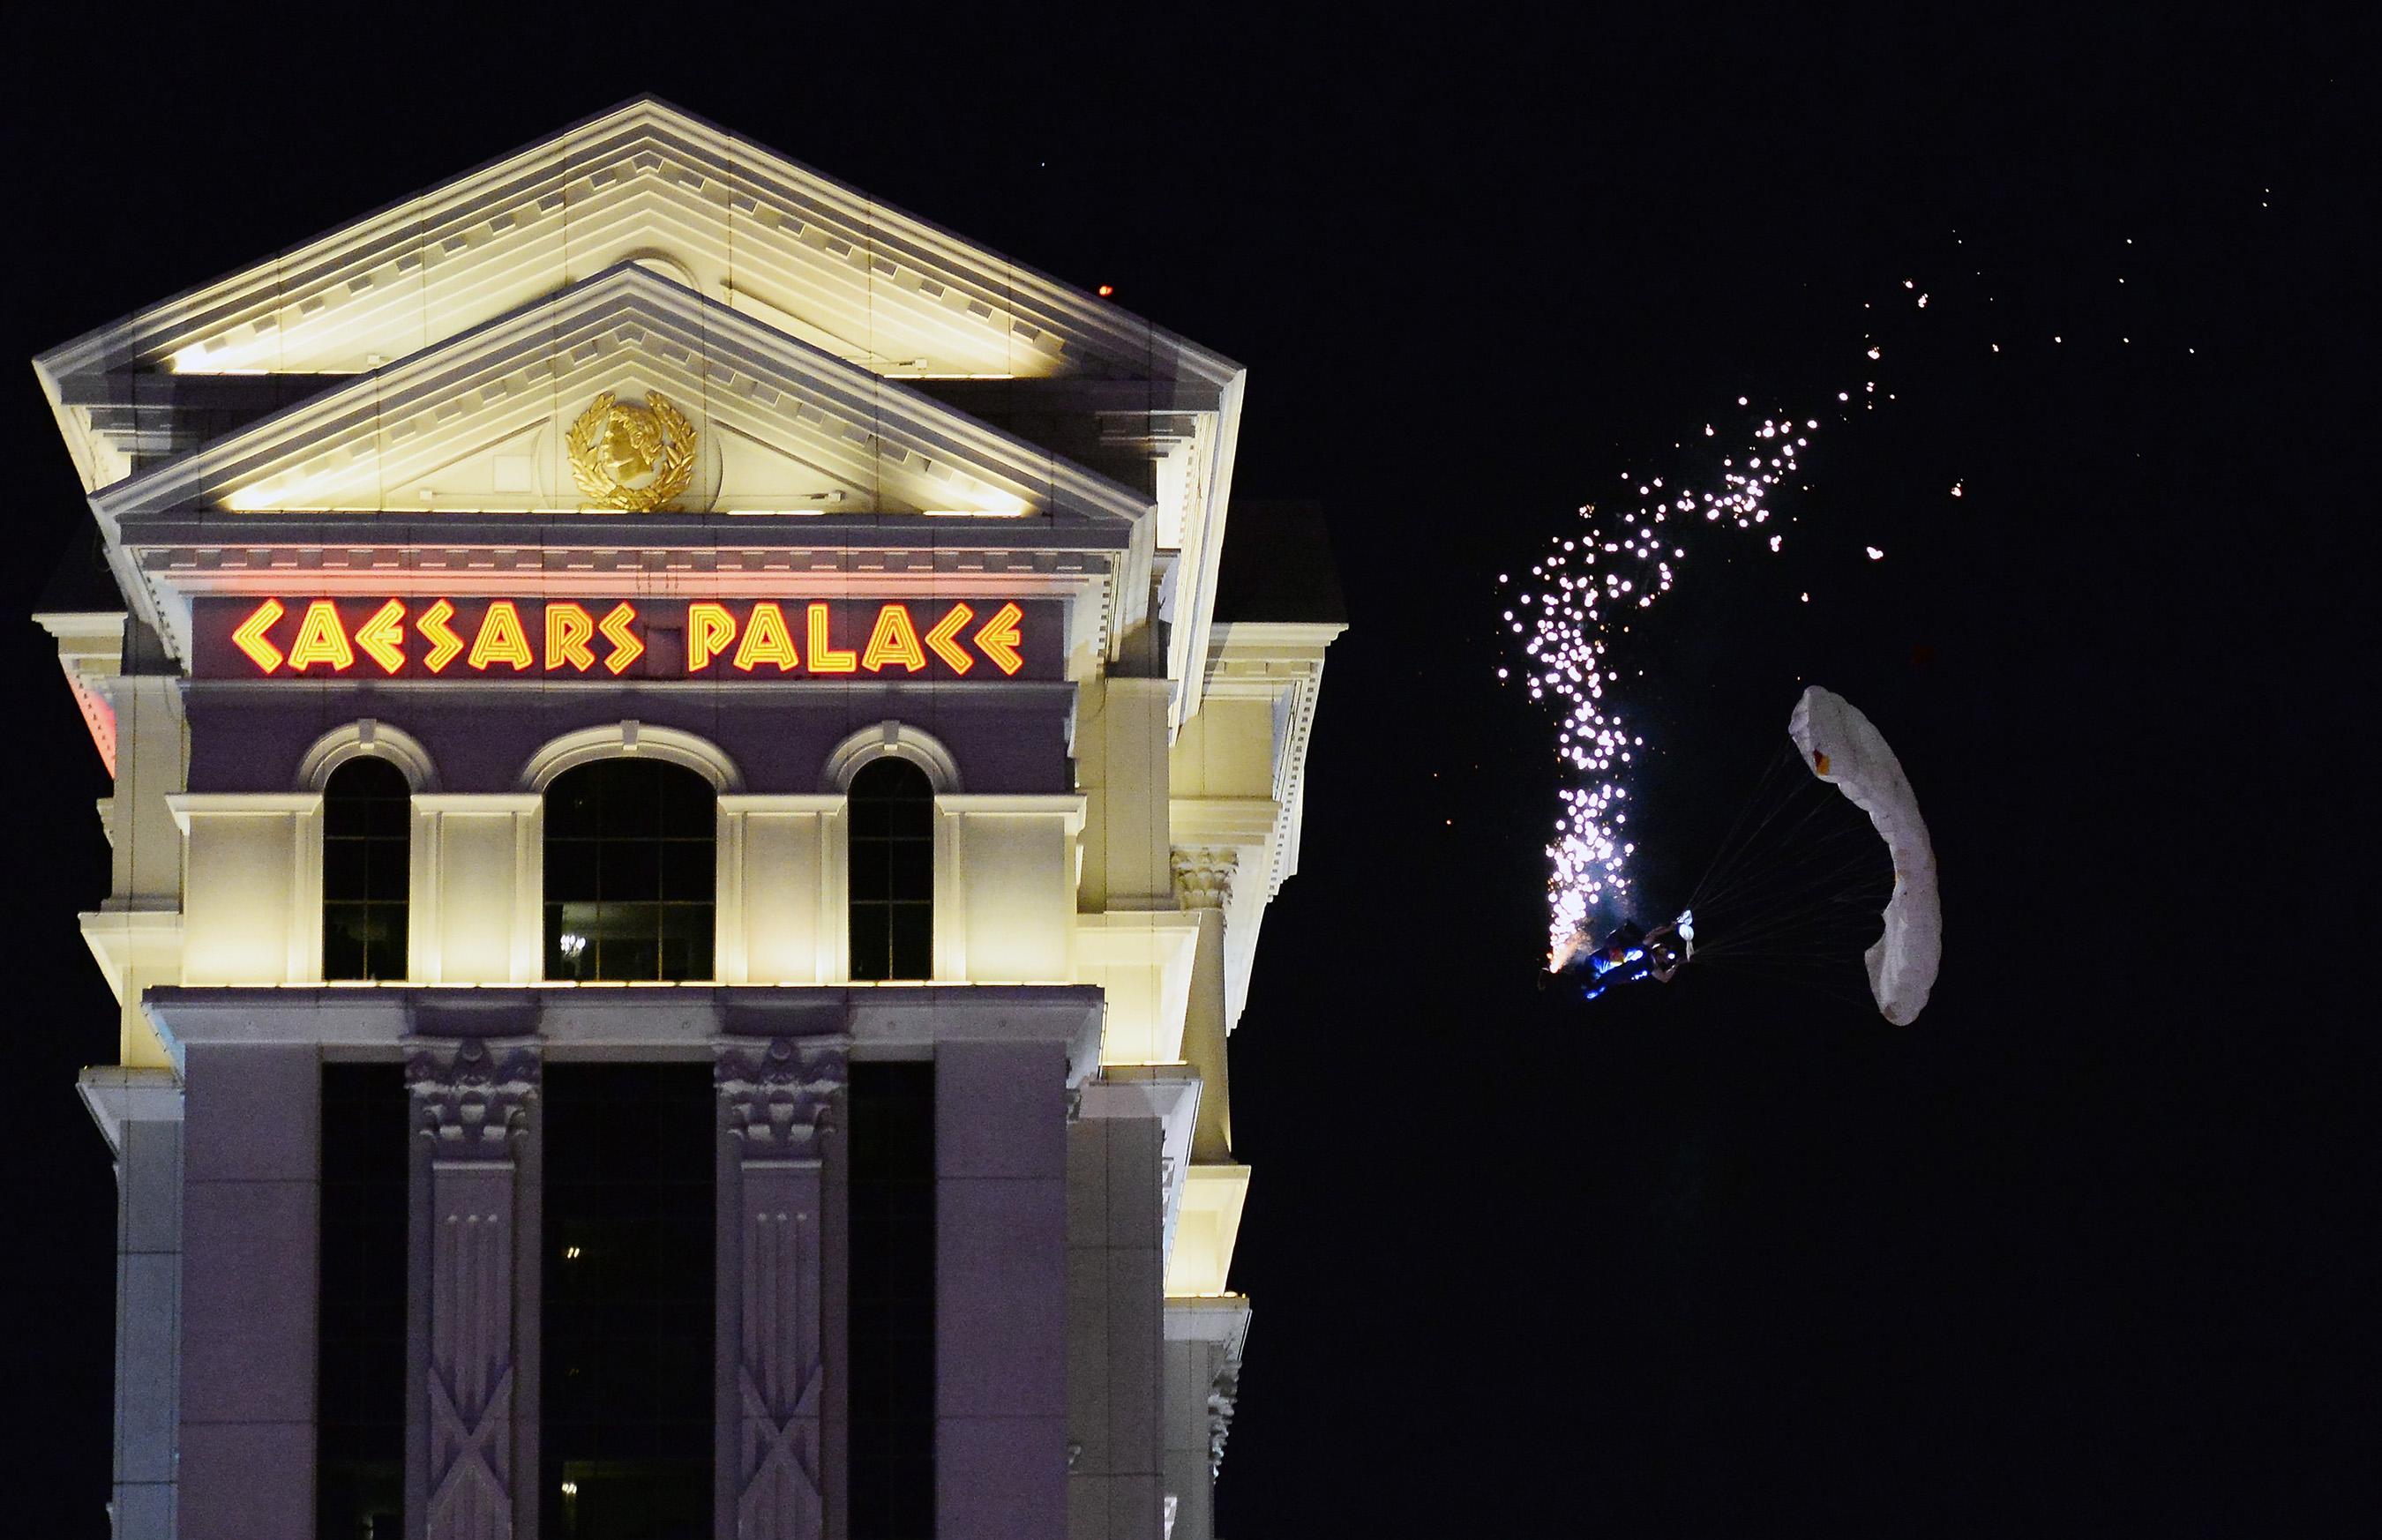 Caesars Palace Front Desk